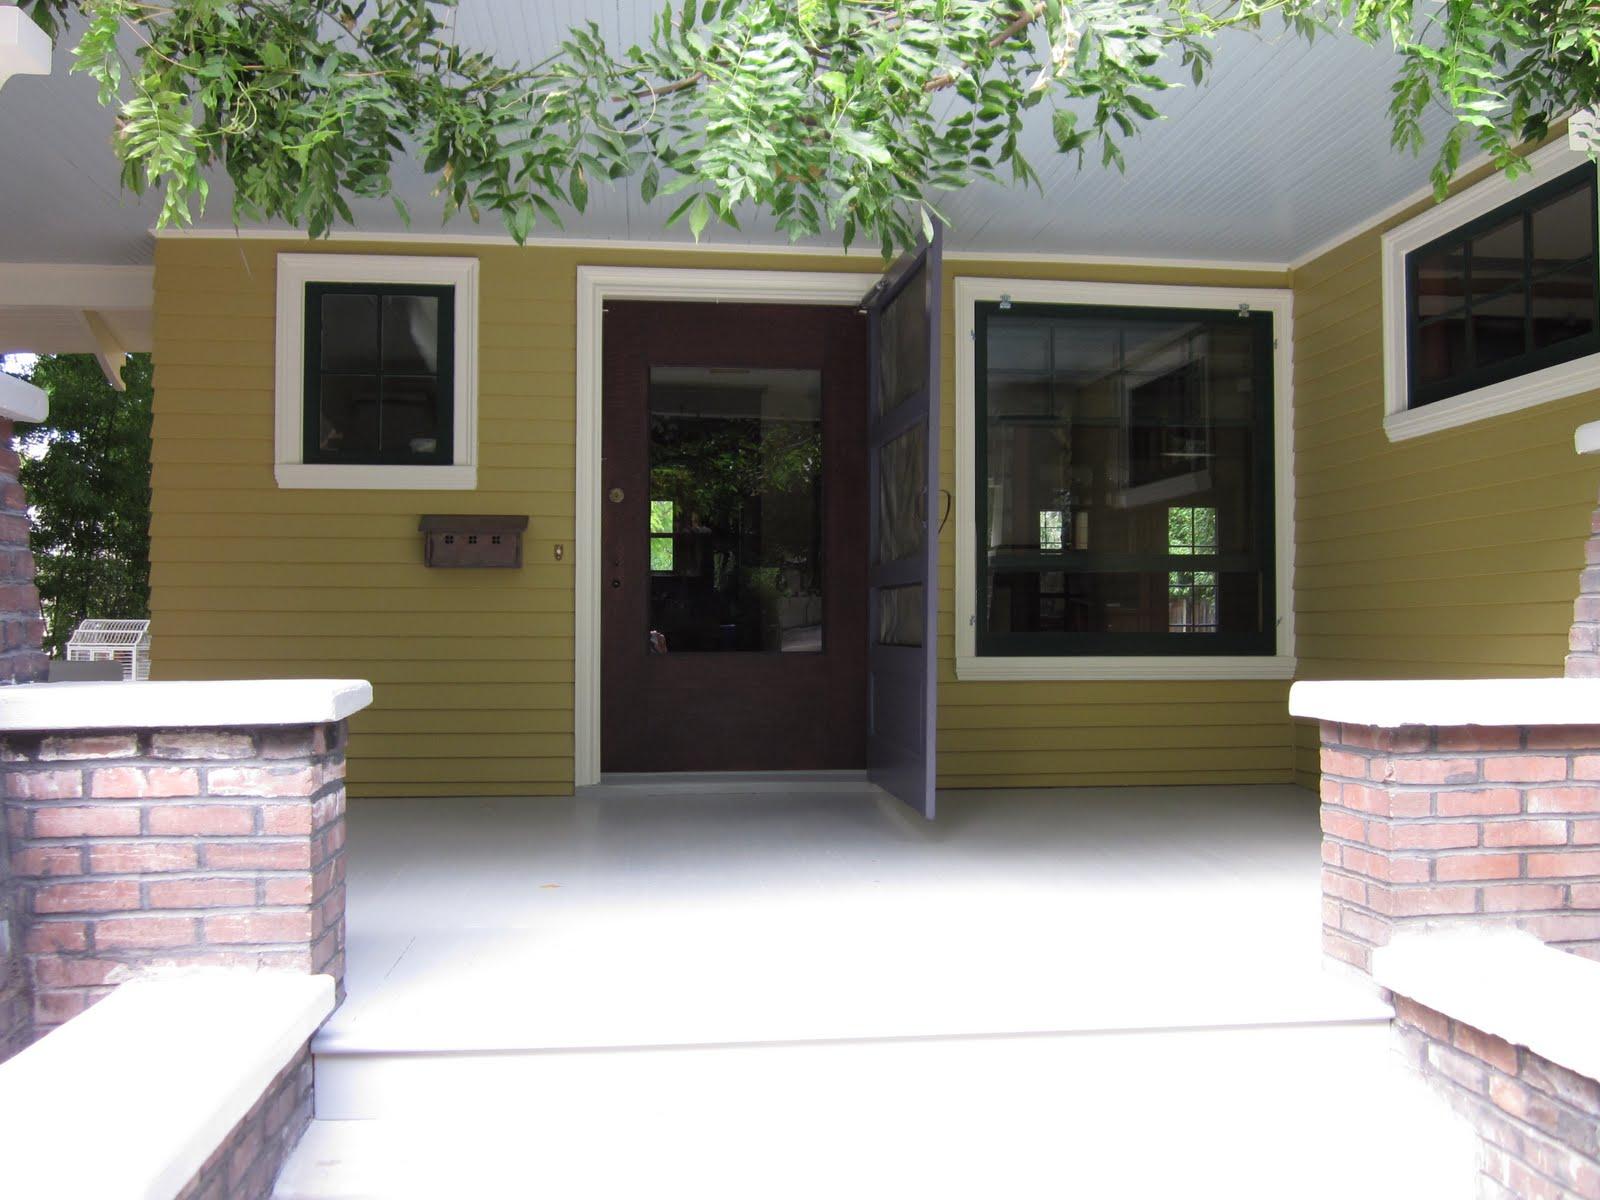 front porch and front door of Craftsman